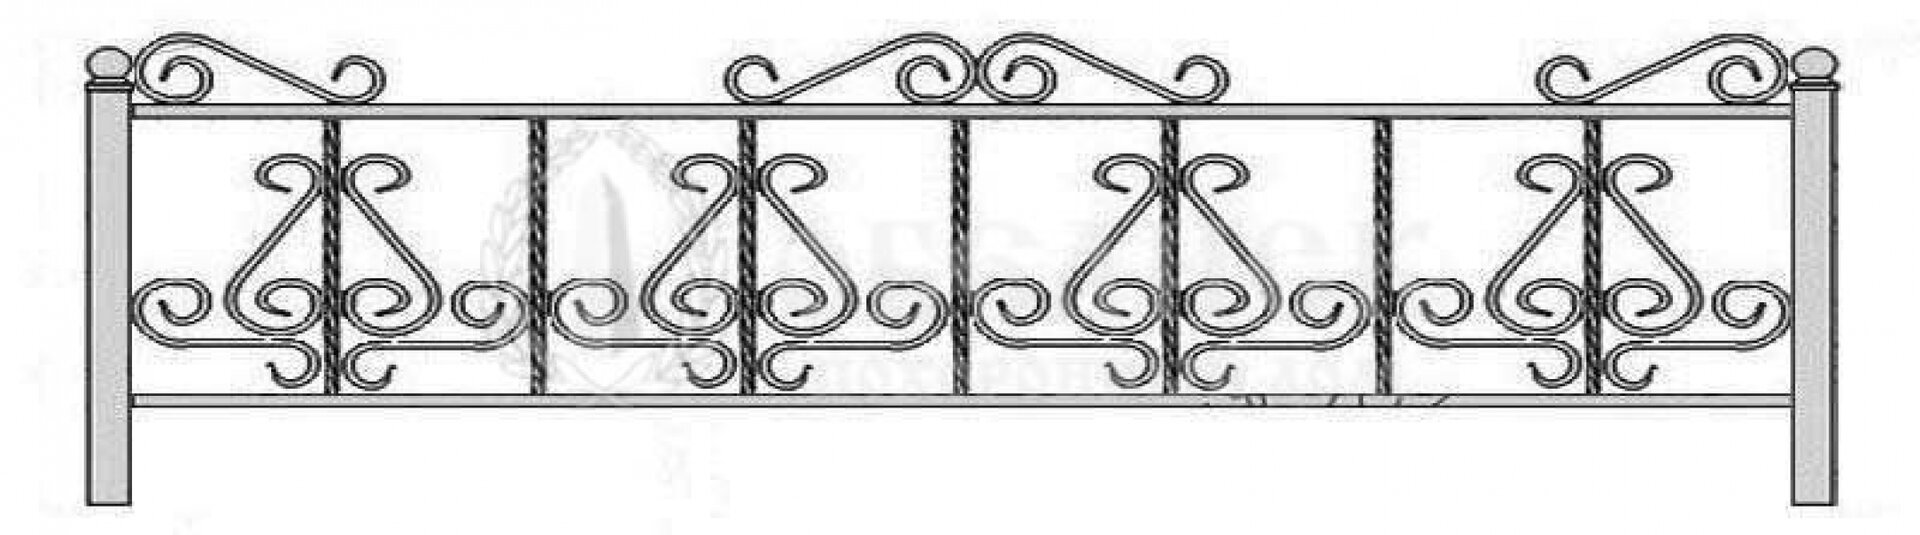 Ограда на могилу кованная №10